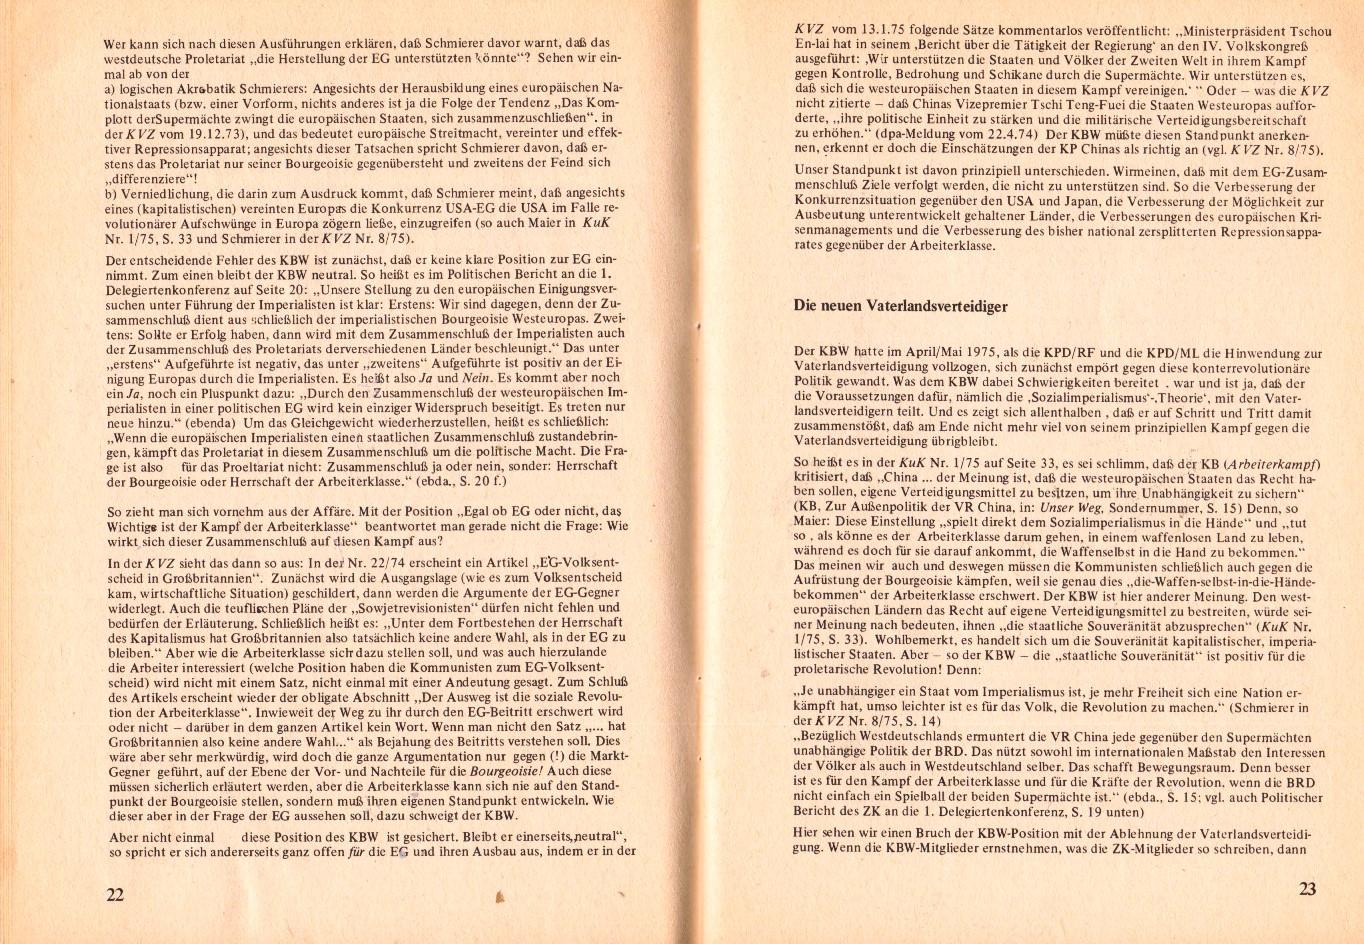 Spartacus_1975_Kritik_des_KBW_13